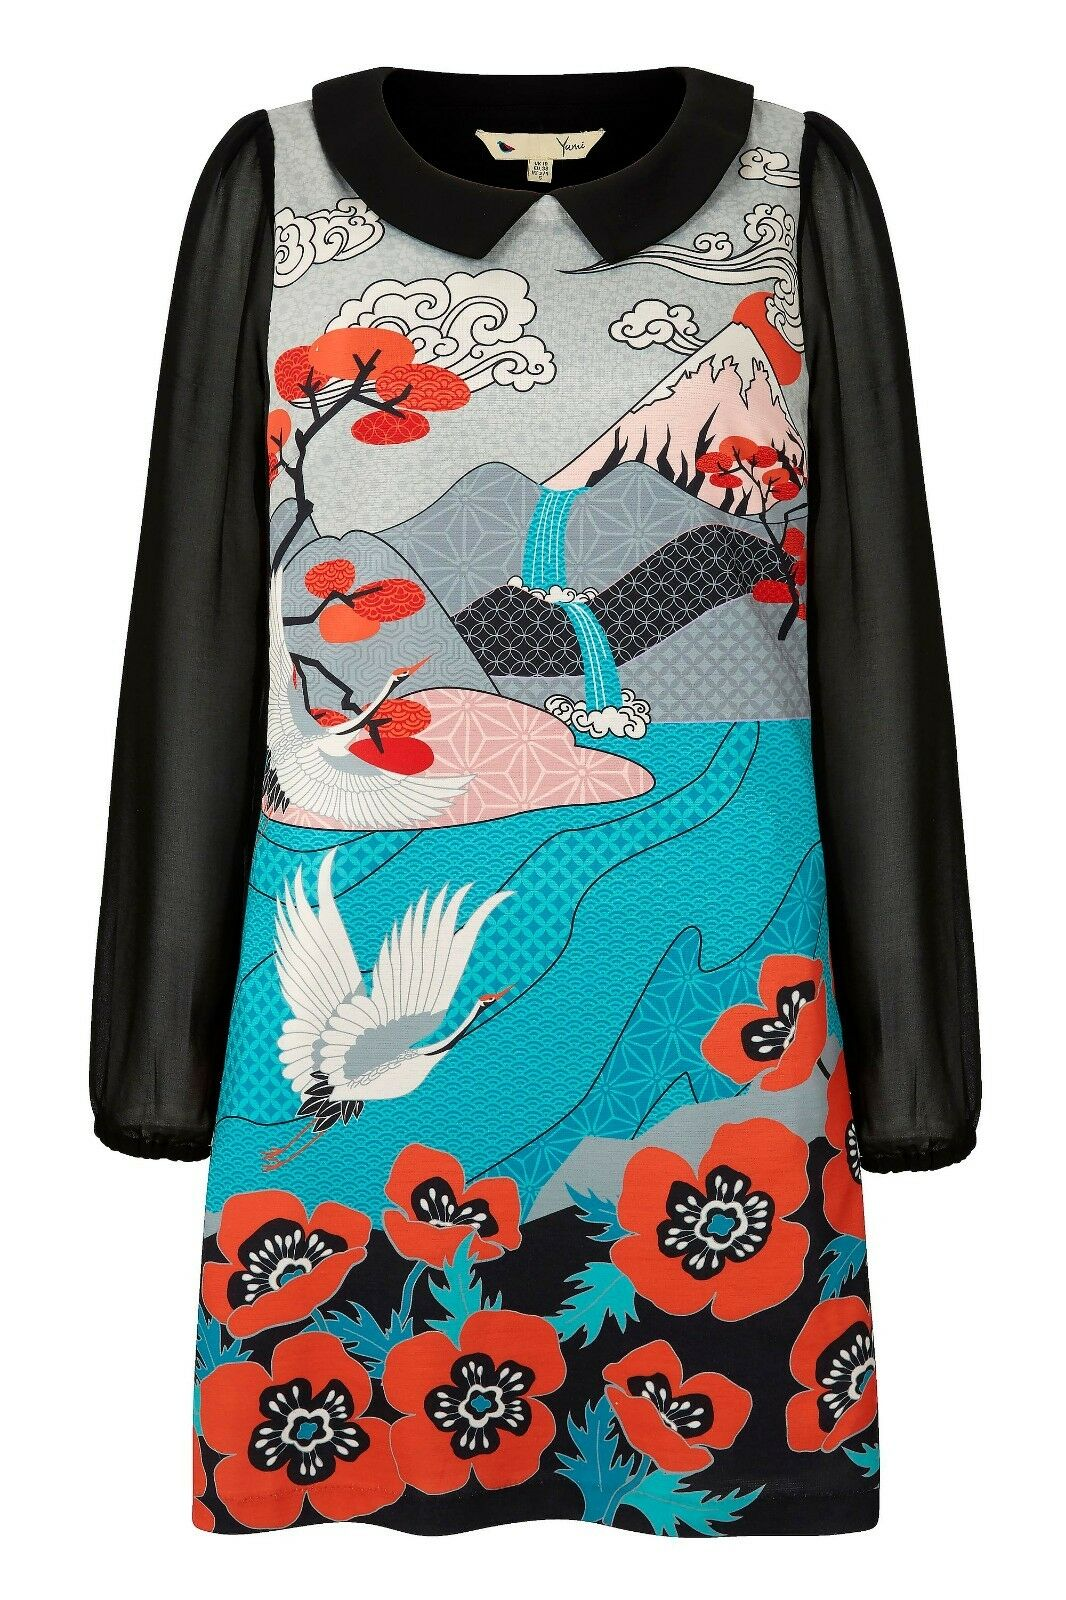 Yumi London Japanese-inspirot Print Long Sleeves Shift Dress S, M, L